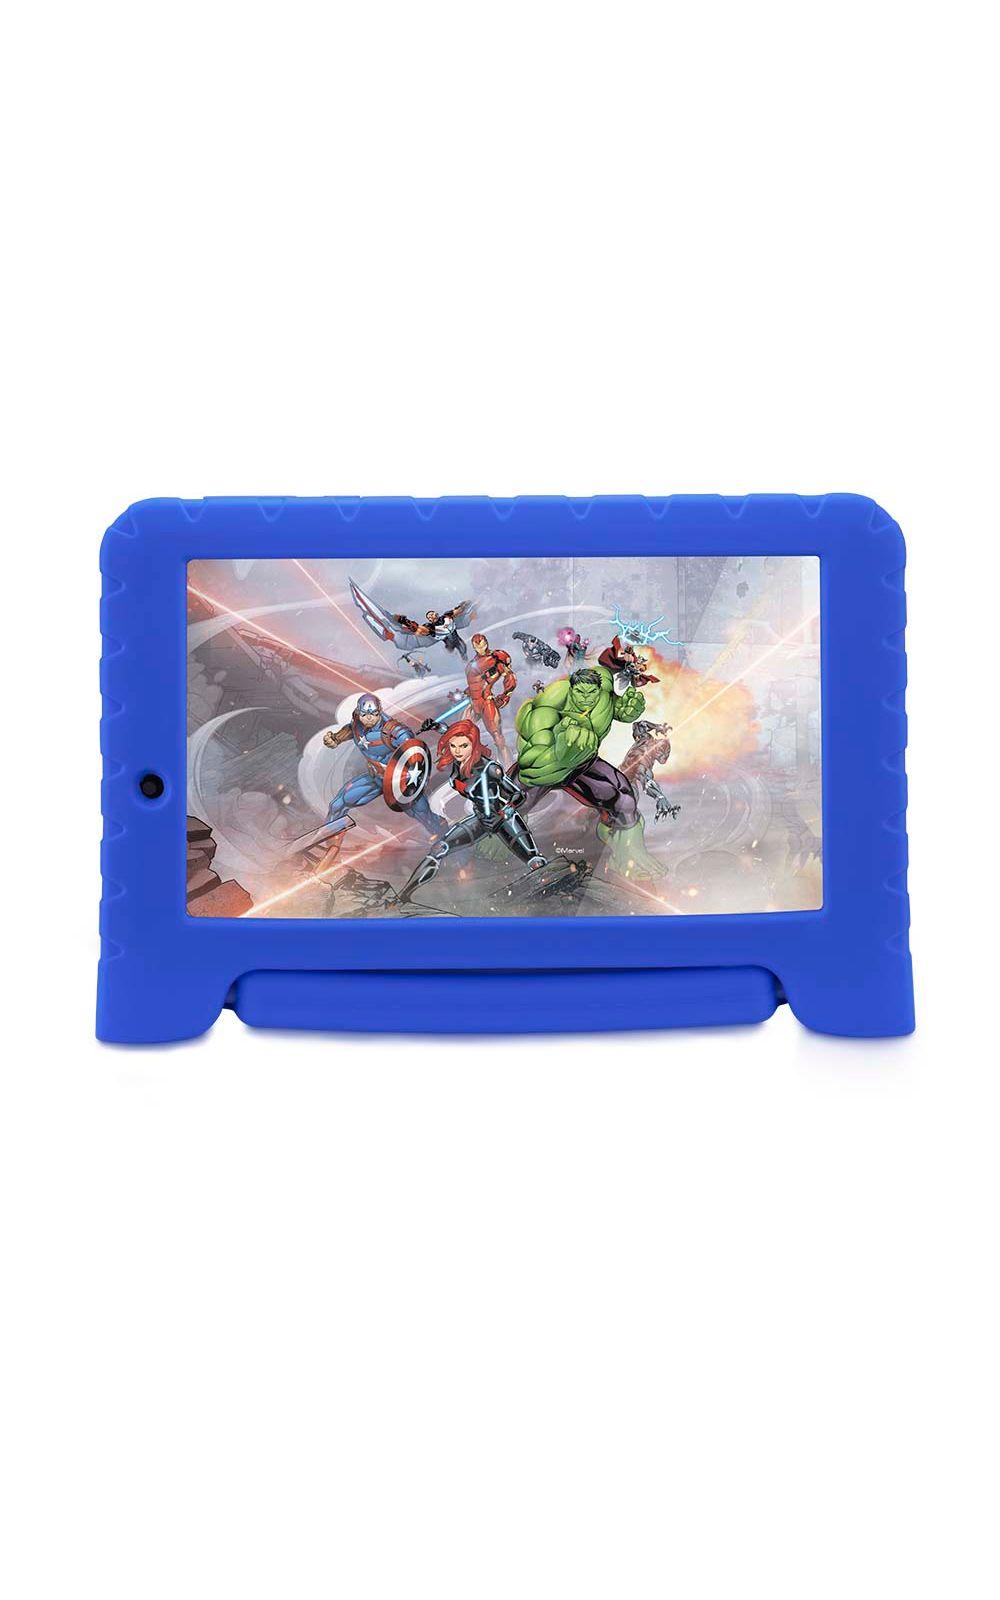 Foto 1 - Tablet Disney Vingadores Plus Wifi 8Gb Android 7 Dual Câmera Azul Multilaser - NB280